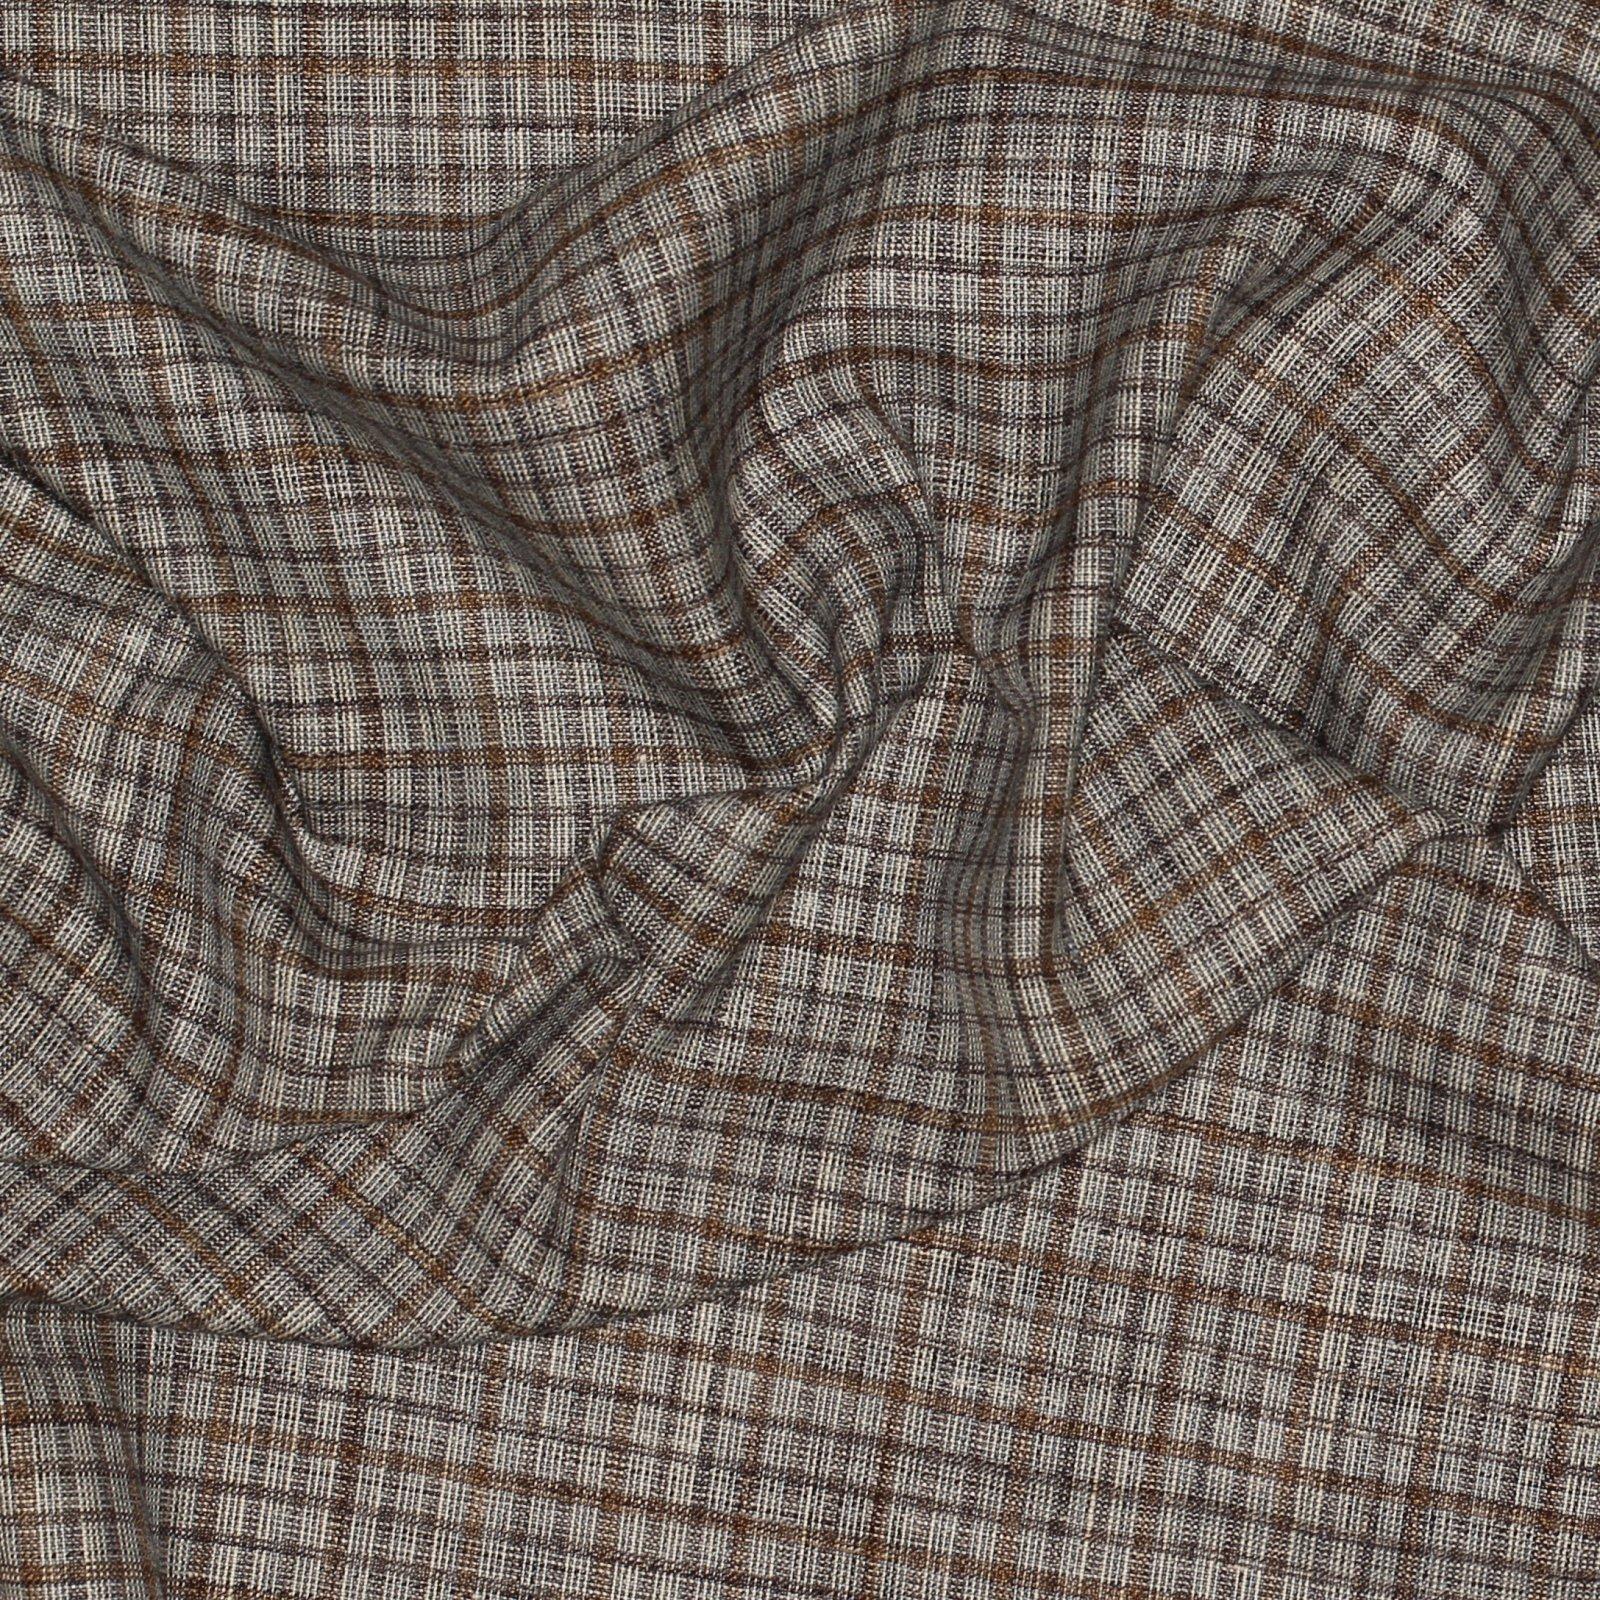 White/Blue/Tan Italian Linen/Silk Tattersall Plaid; 60